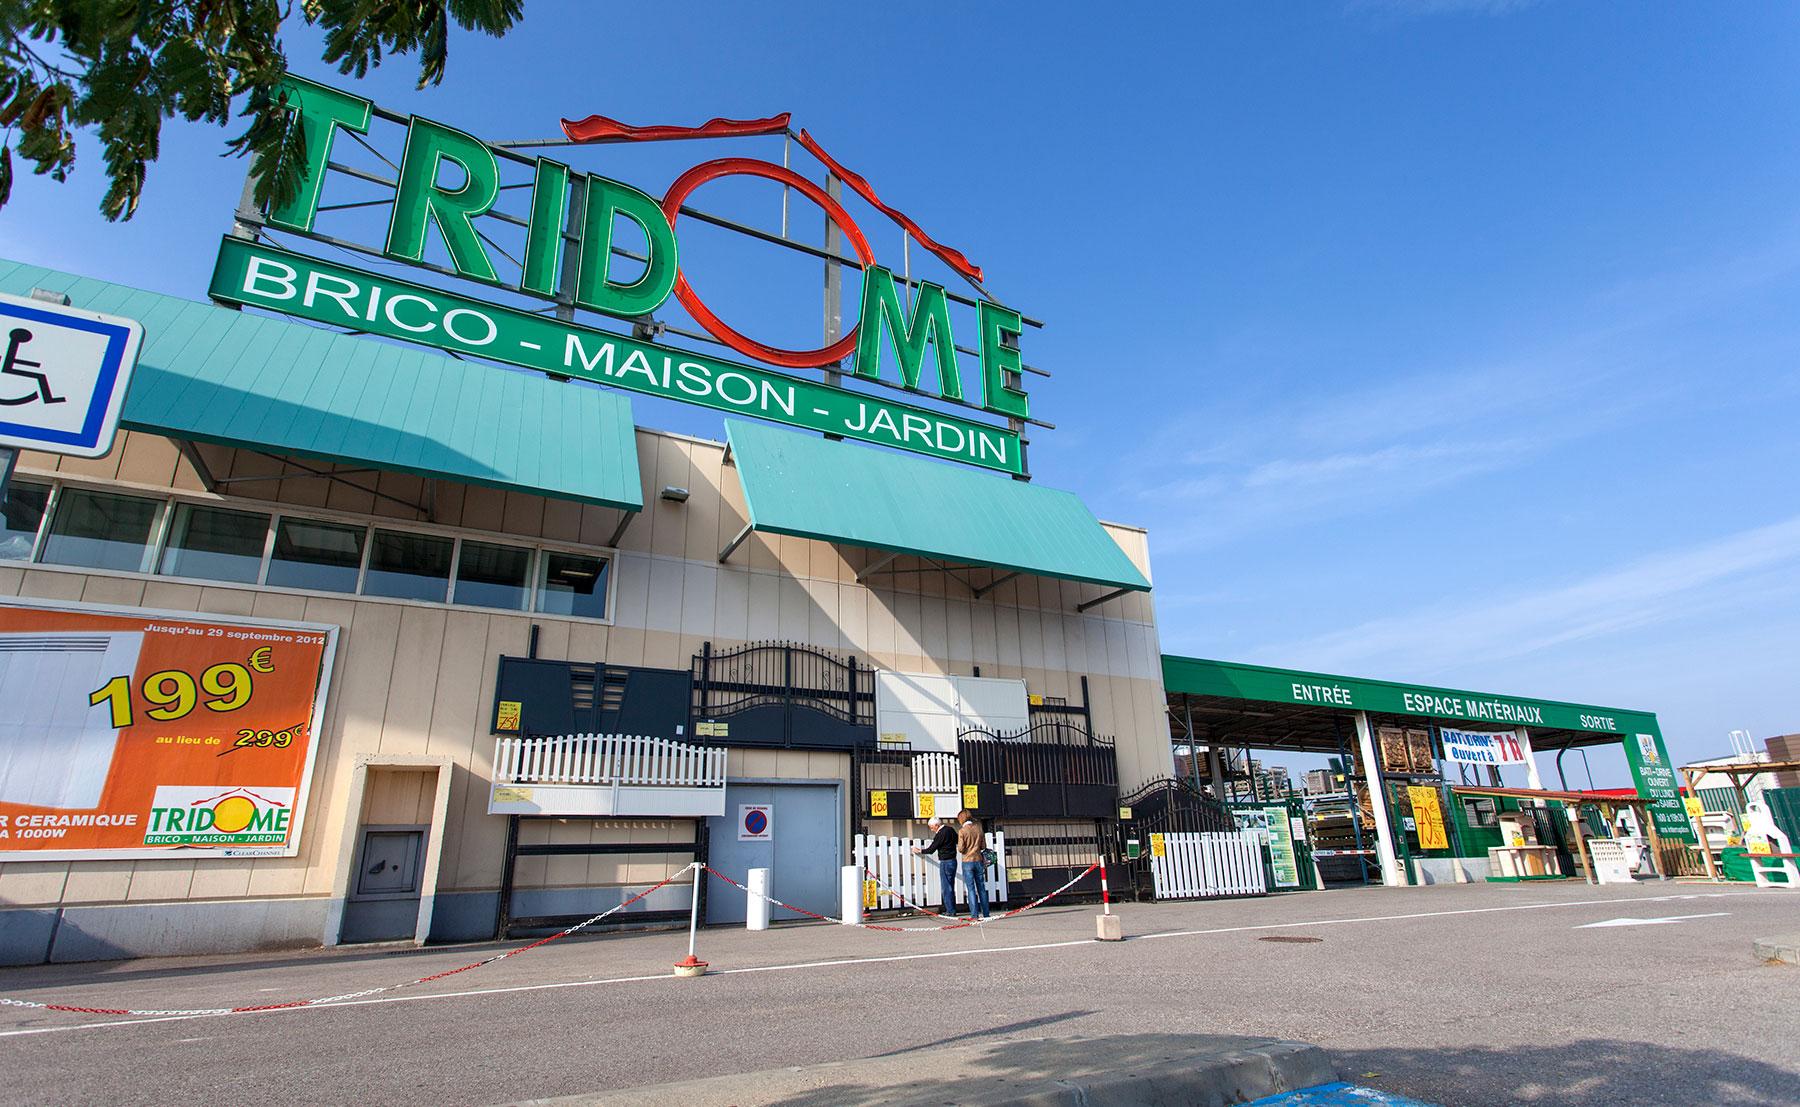 commerce Tridome